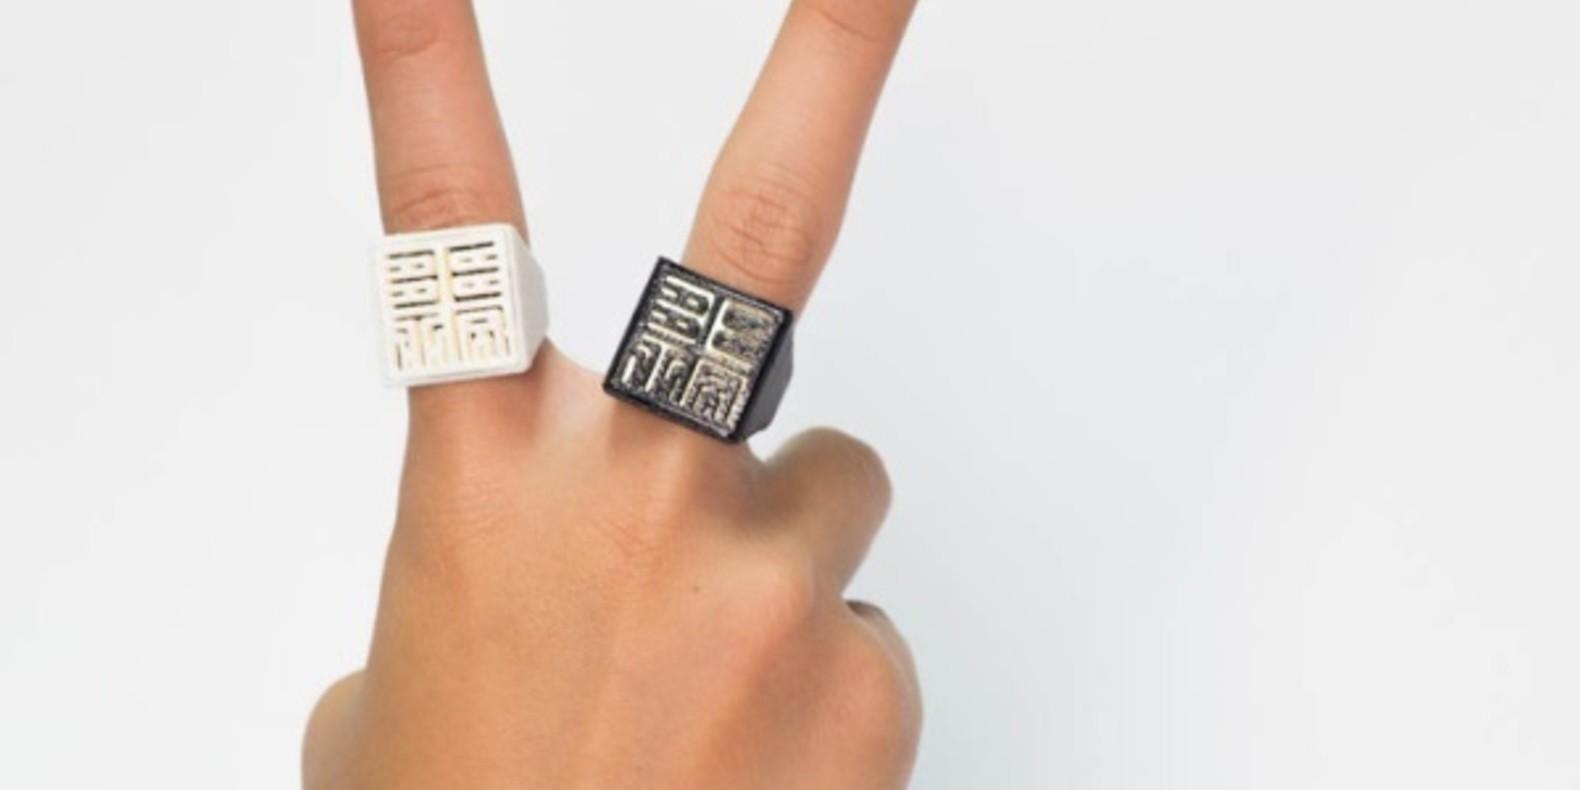 sesame ring theory 3D printed bague imprimée en 3D cults3D fichier 3D kickstarter boston MIT 4